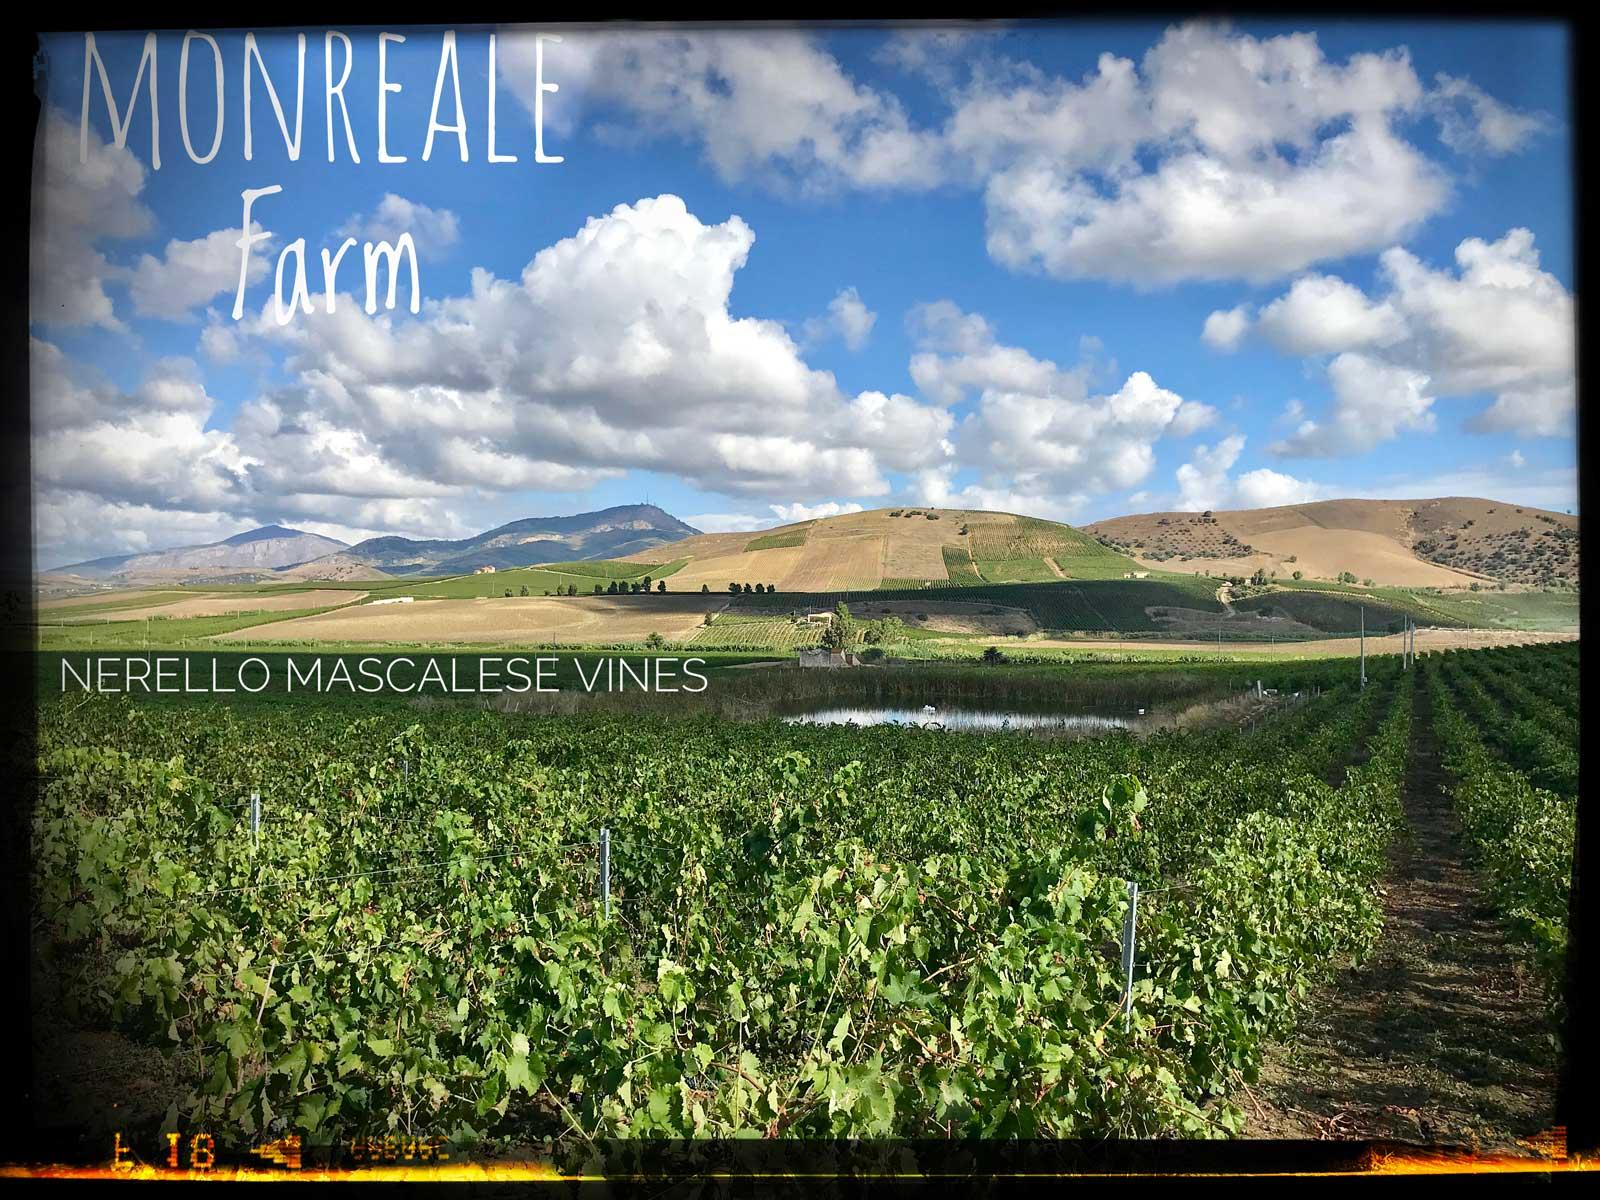 monreale_farm_crop.jpg